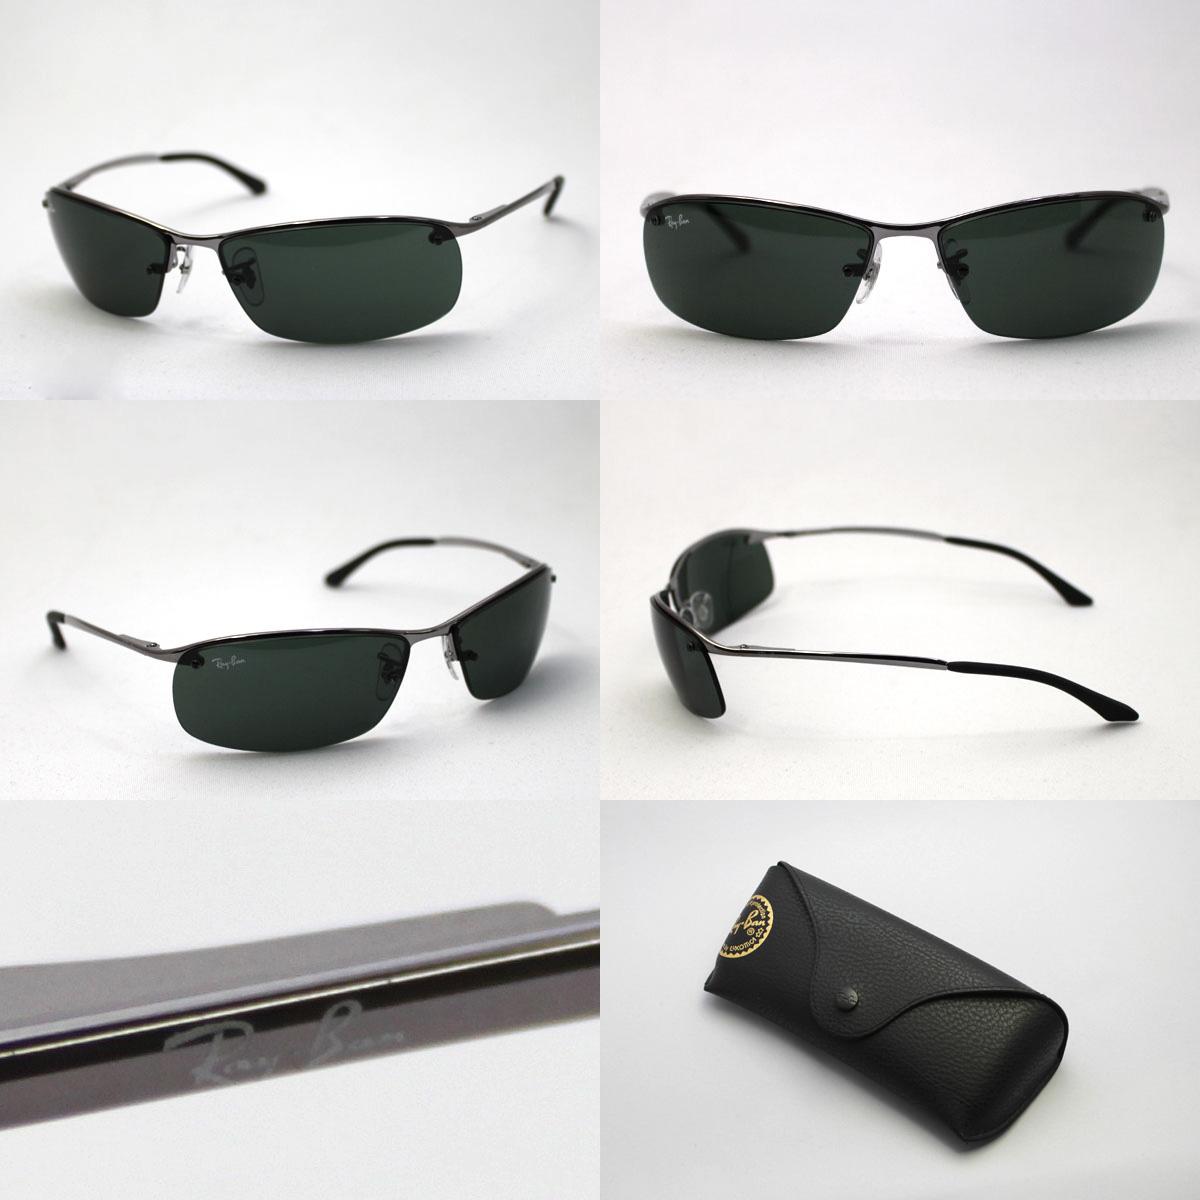 Ray Ban RB3183 00471 RayBan sunglasses glassmania sunglasses